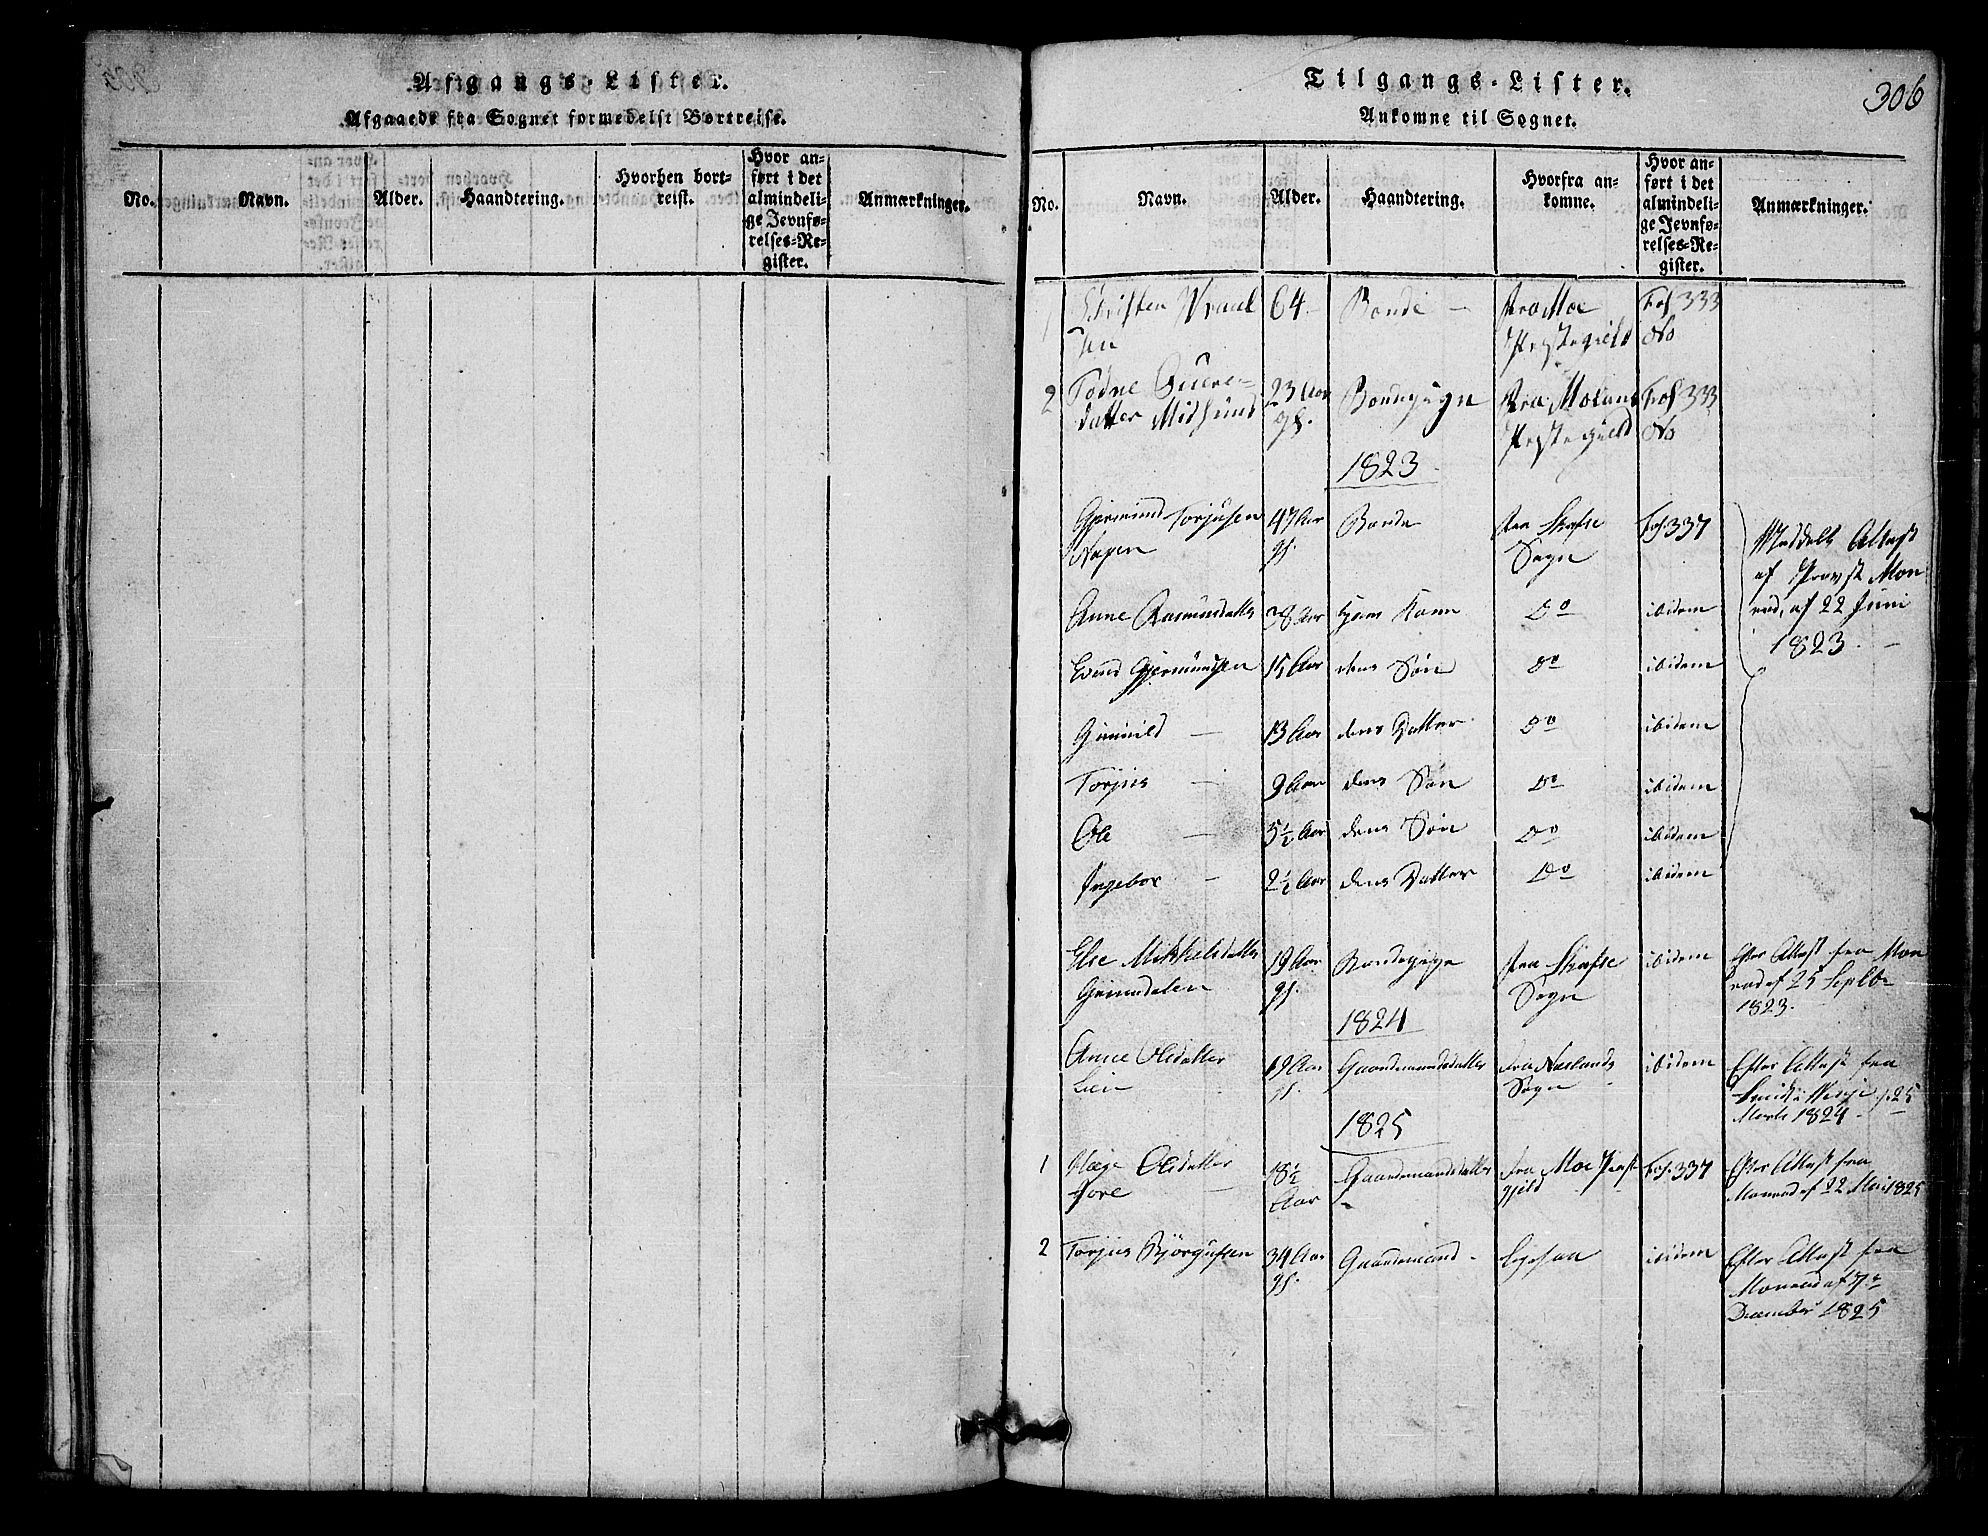 SAKO, Lårdal kirkebøker, G/Gb/L0001: Klokkerbok nr. II 1, 1815-1865, s. 306